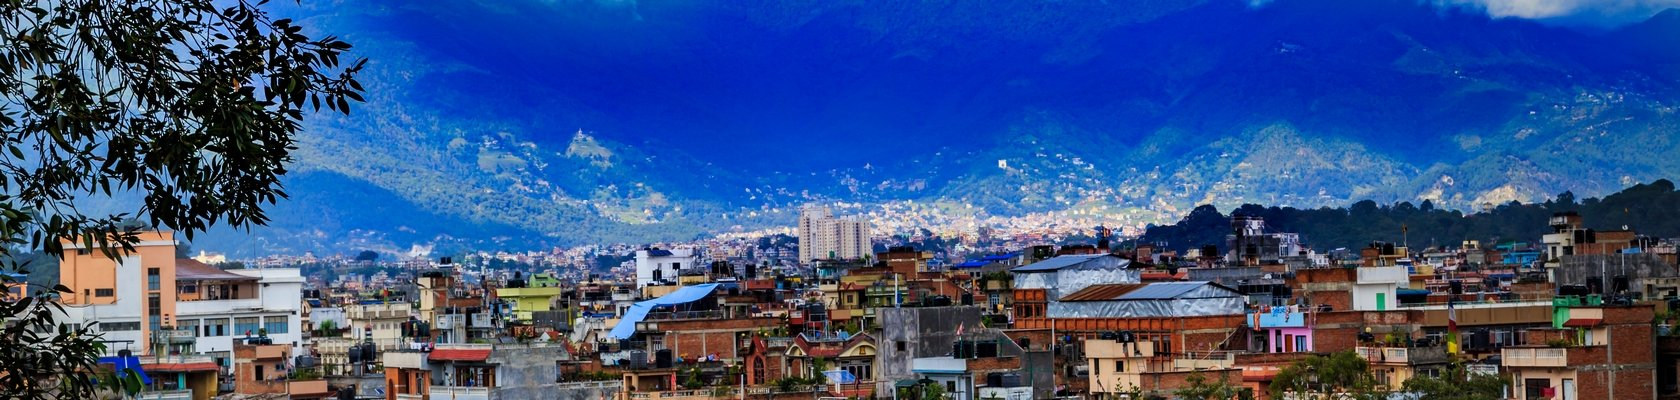 Indrukwekkend Kathmandu